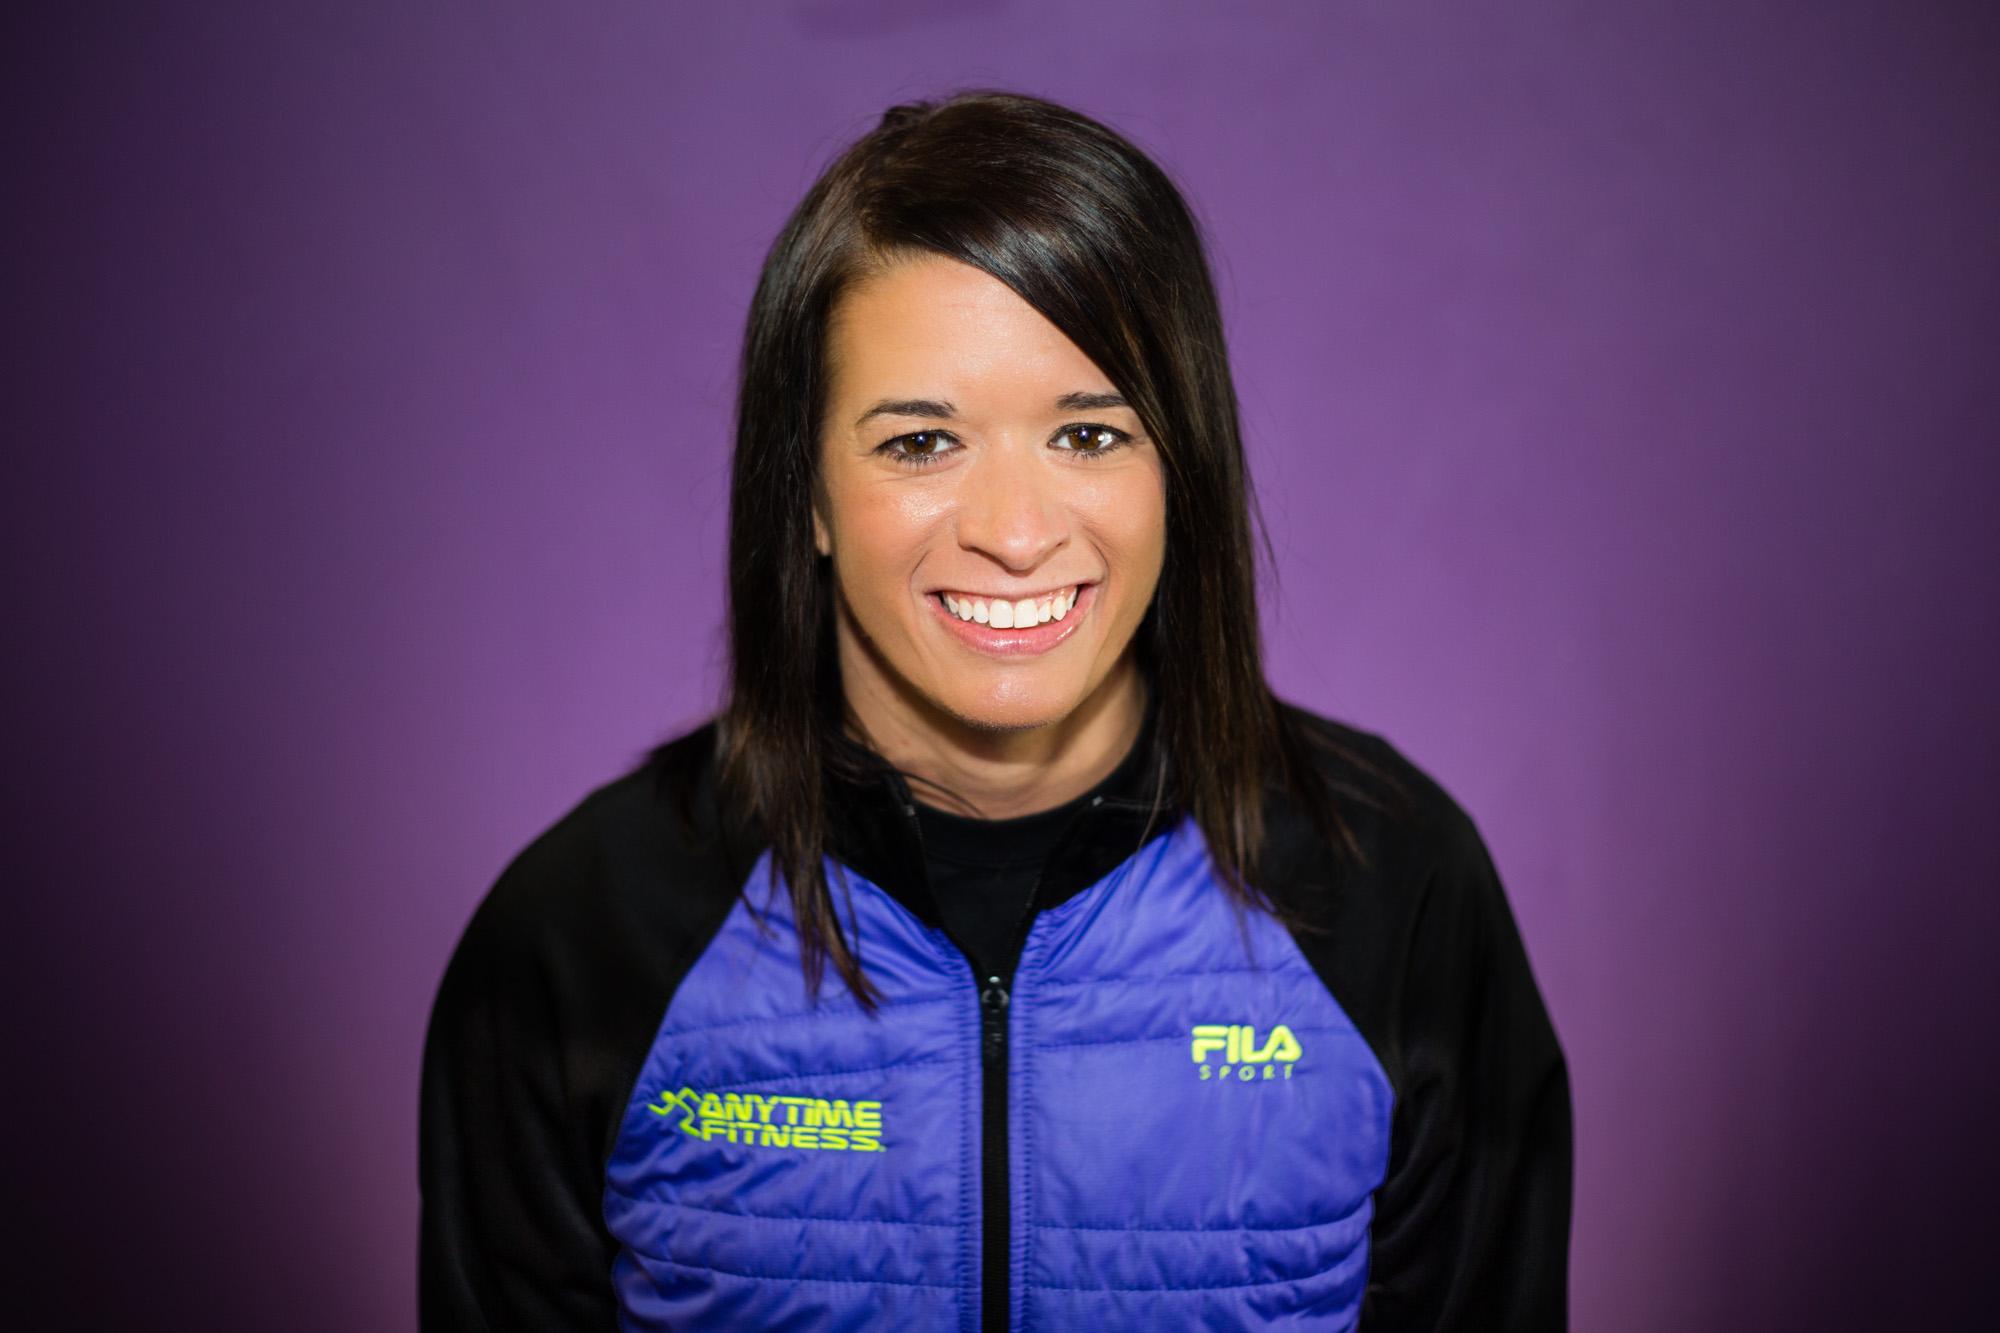 Erika Hanaway